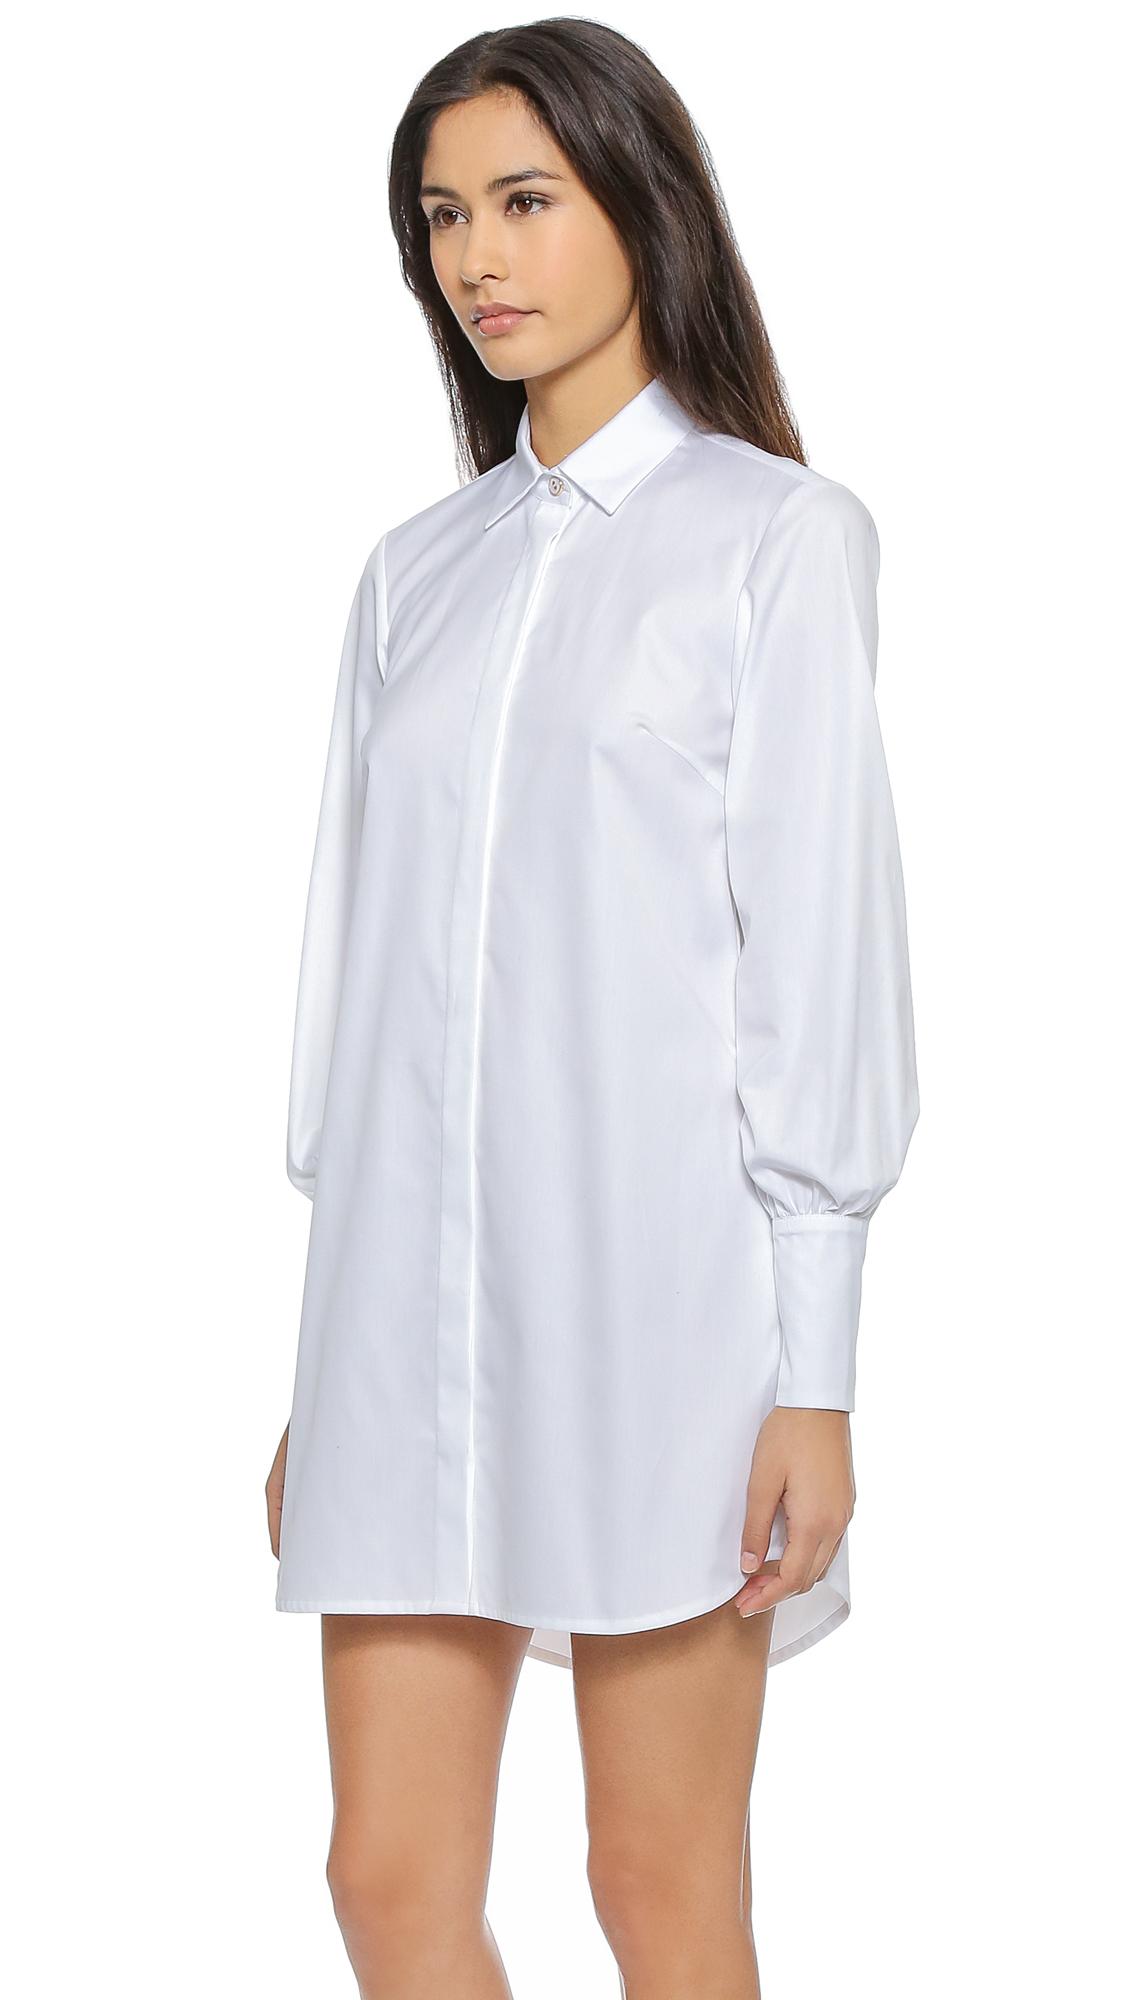 5057fe70efcc0f Caroline Constas Boyfriend Shirtdress - Solid White in White - Lyst